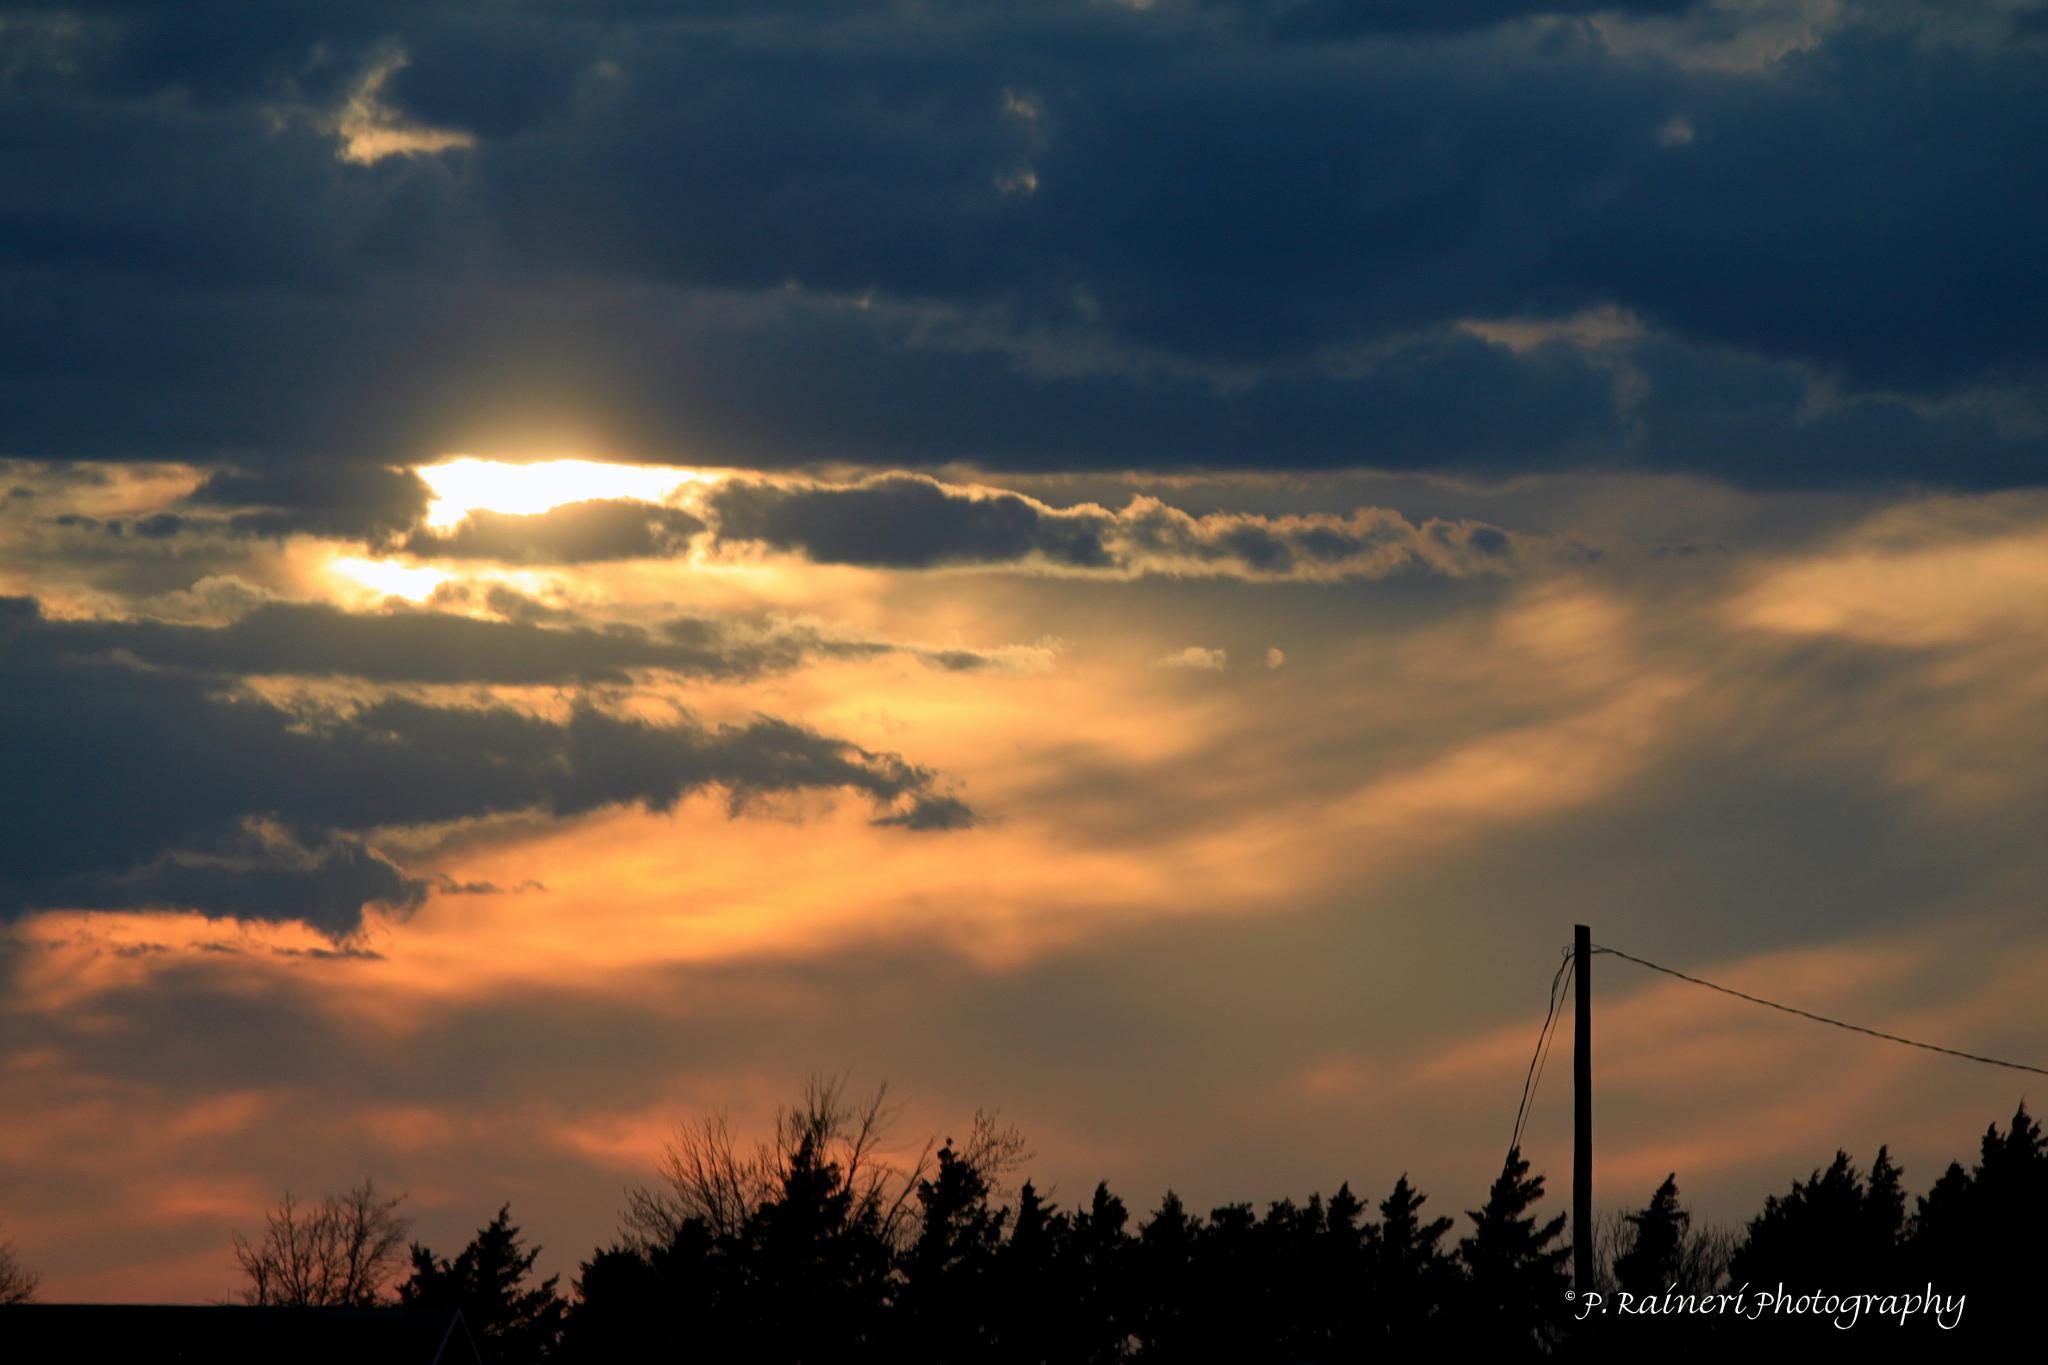 Sunset & Clouds by pamela.raineri.1